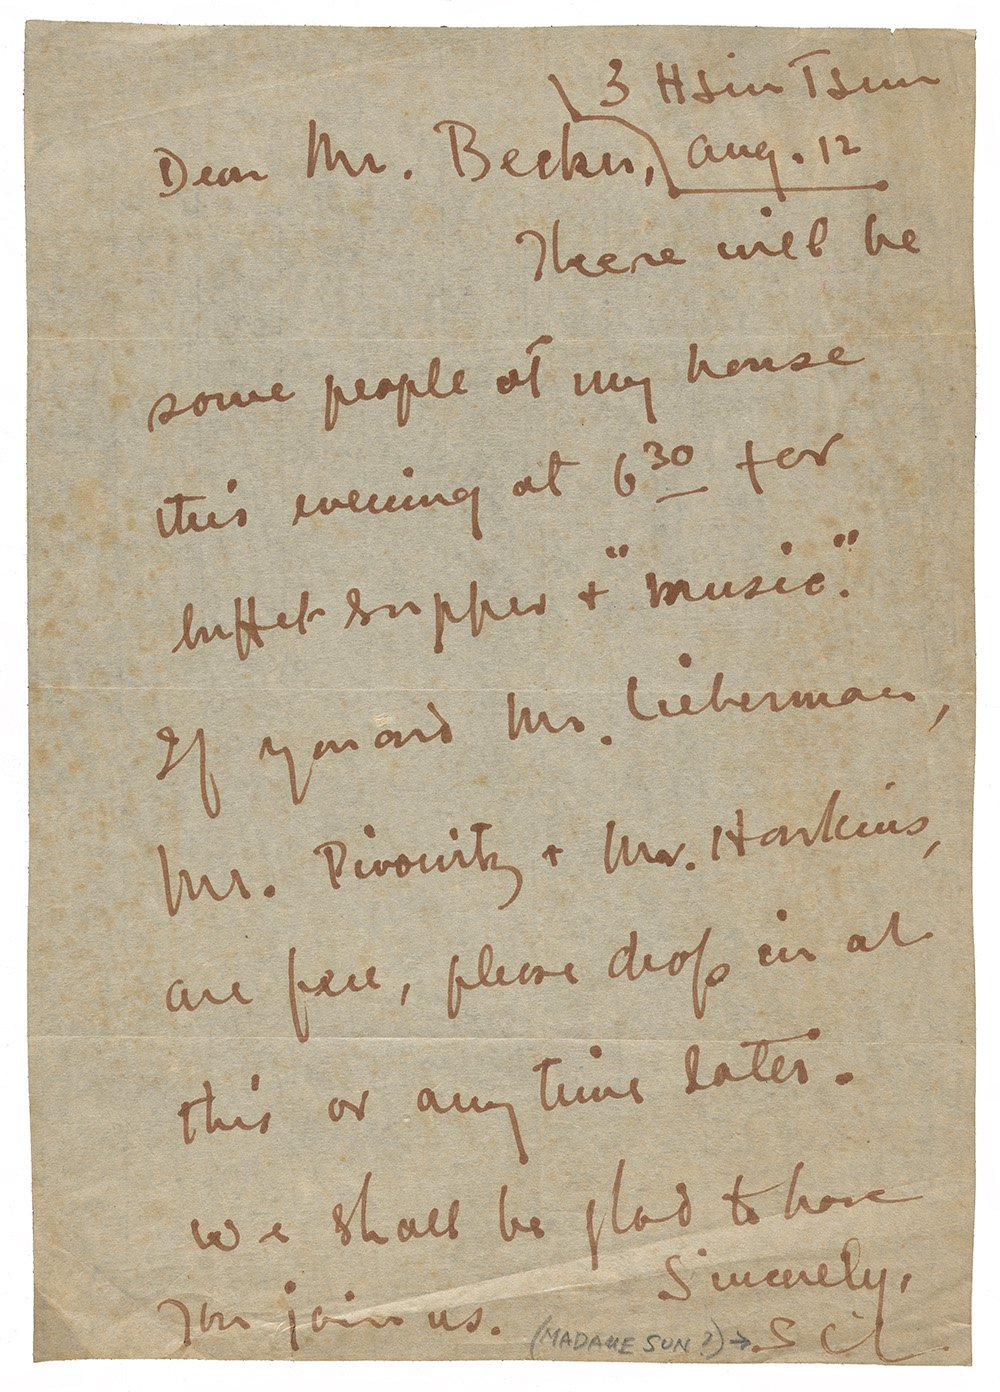 Letter to Fred Becker from Madam Sun Yat-sen